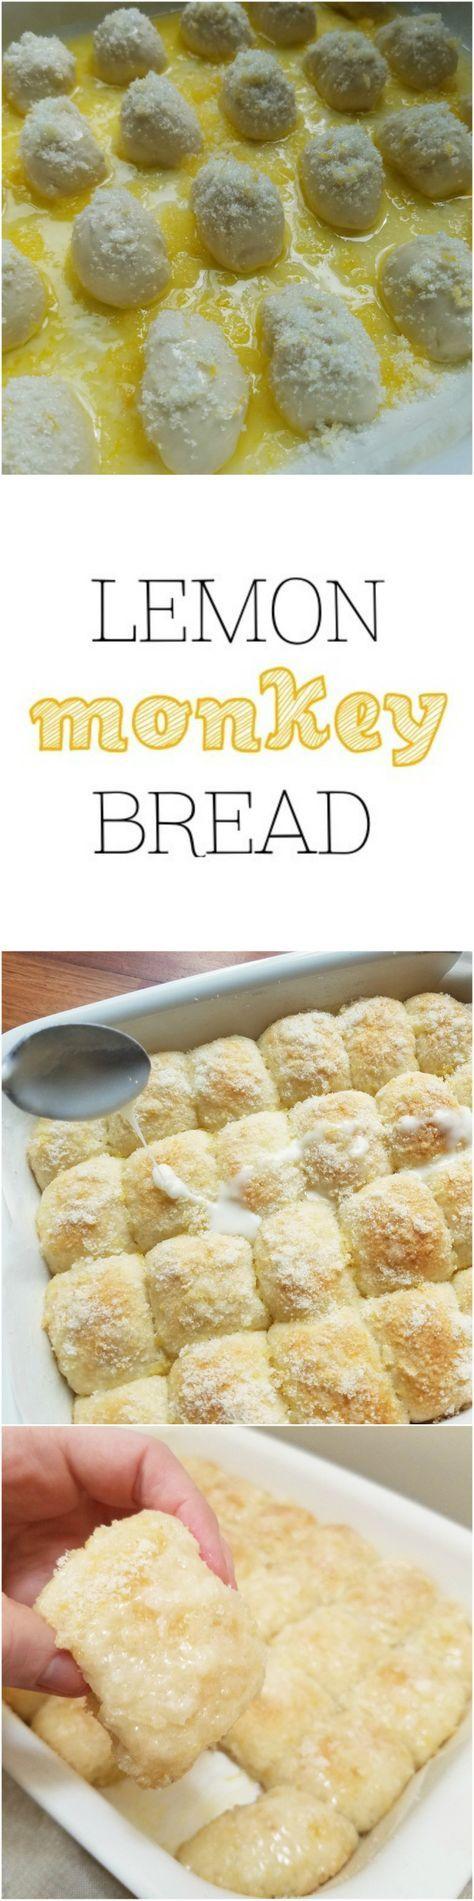 Easy Lemon Monkey Bread using frozen Rhodes rolls - by Rumbly in my Tumbly